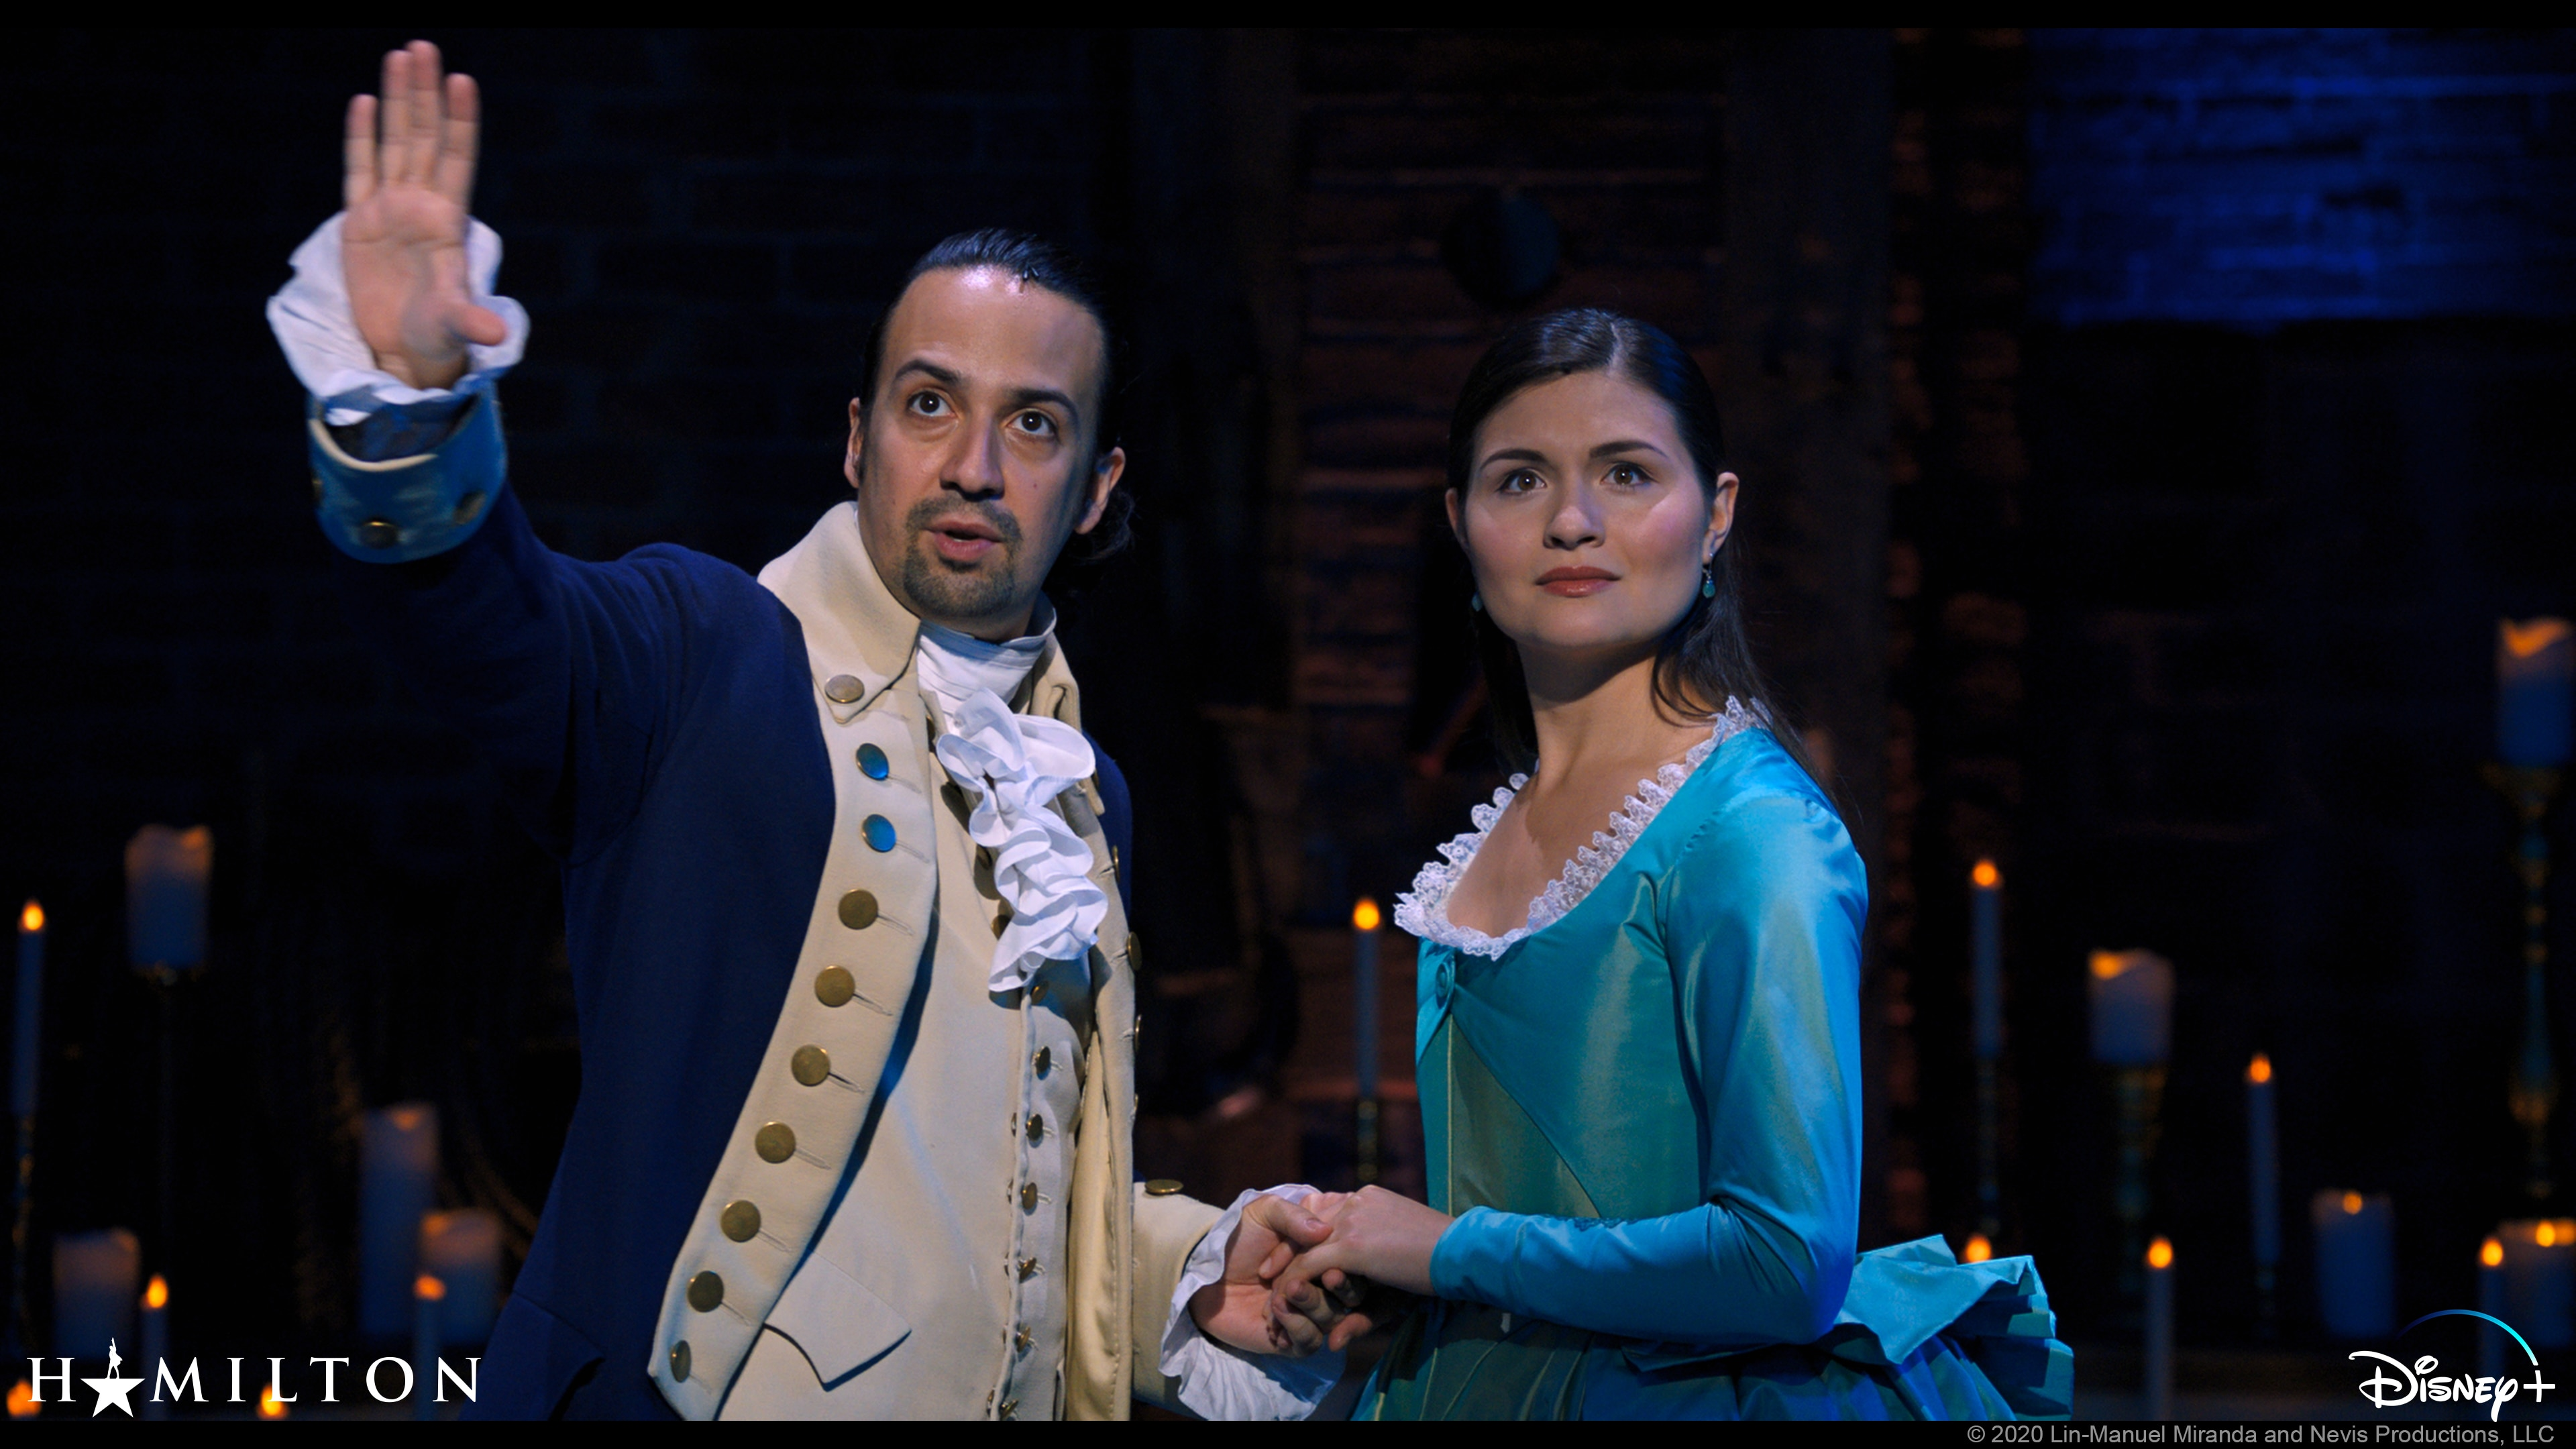 Alexander Hamilton (Lin-Manuel Miranda) e Eliza Schuyler (Phillipa Soo)